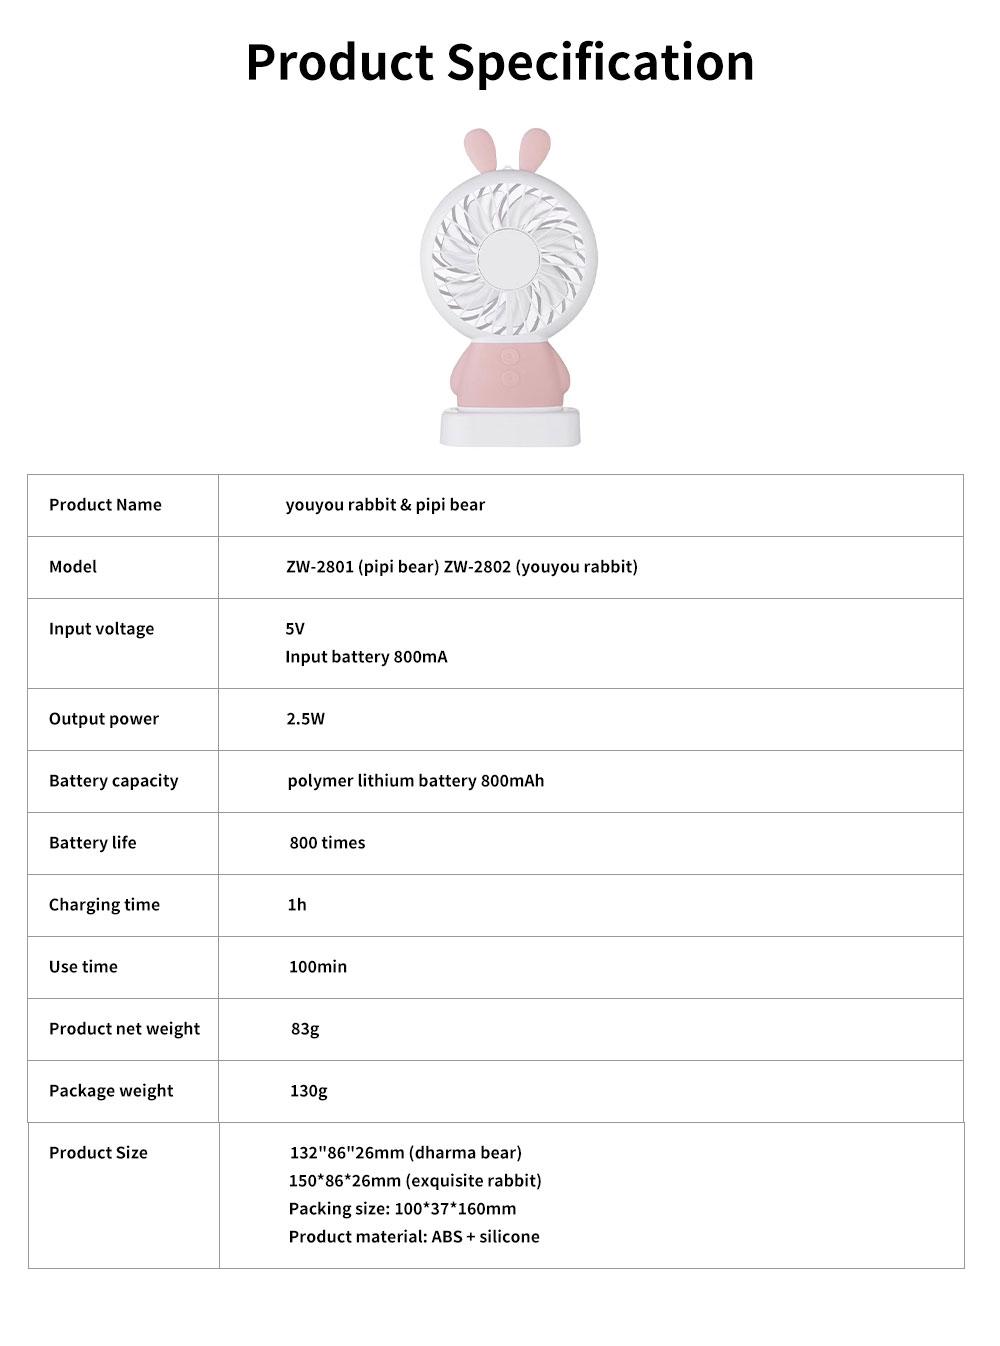 New Rabbit Mini Handheld Fan, Dharma Bear Night Light USB Charging Fan, Outdoor Compact and Convenient Electric Fan 6